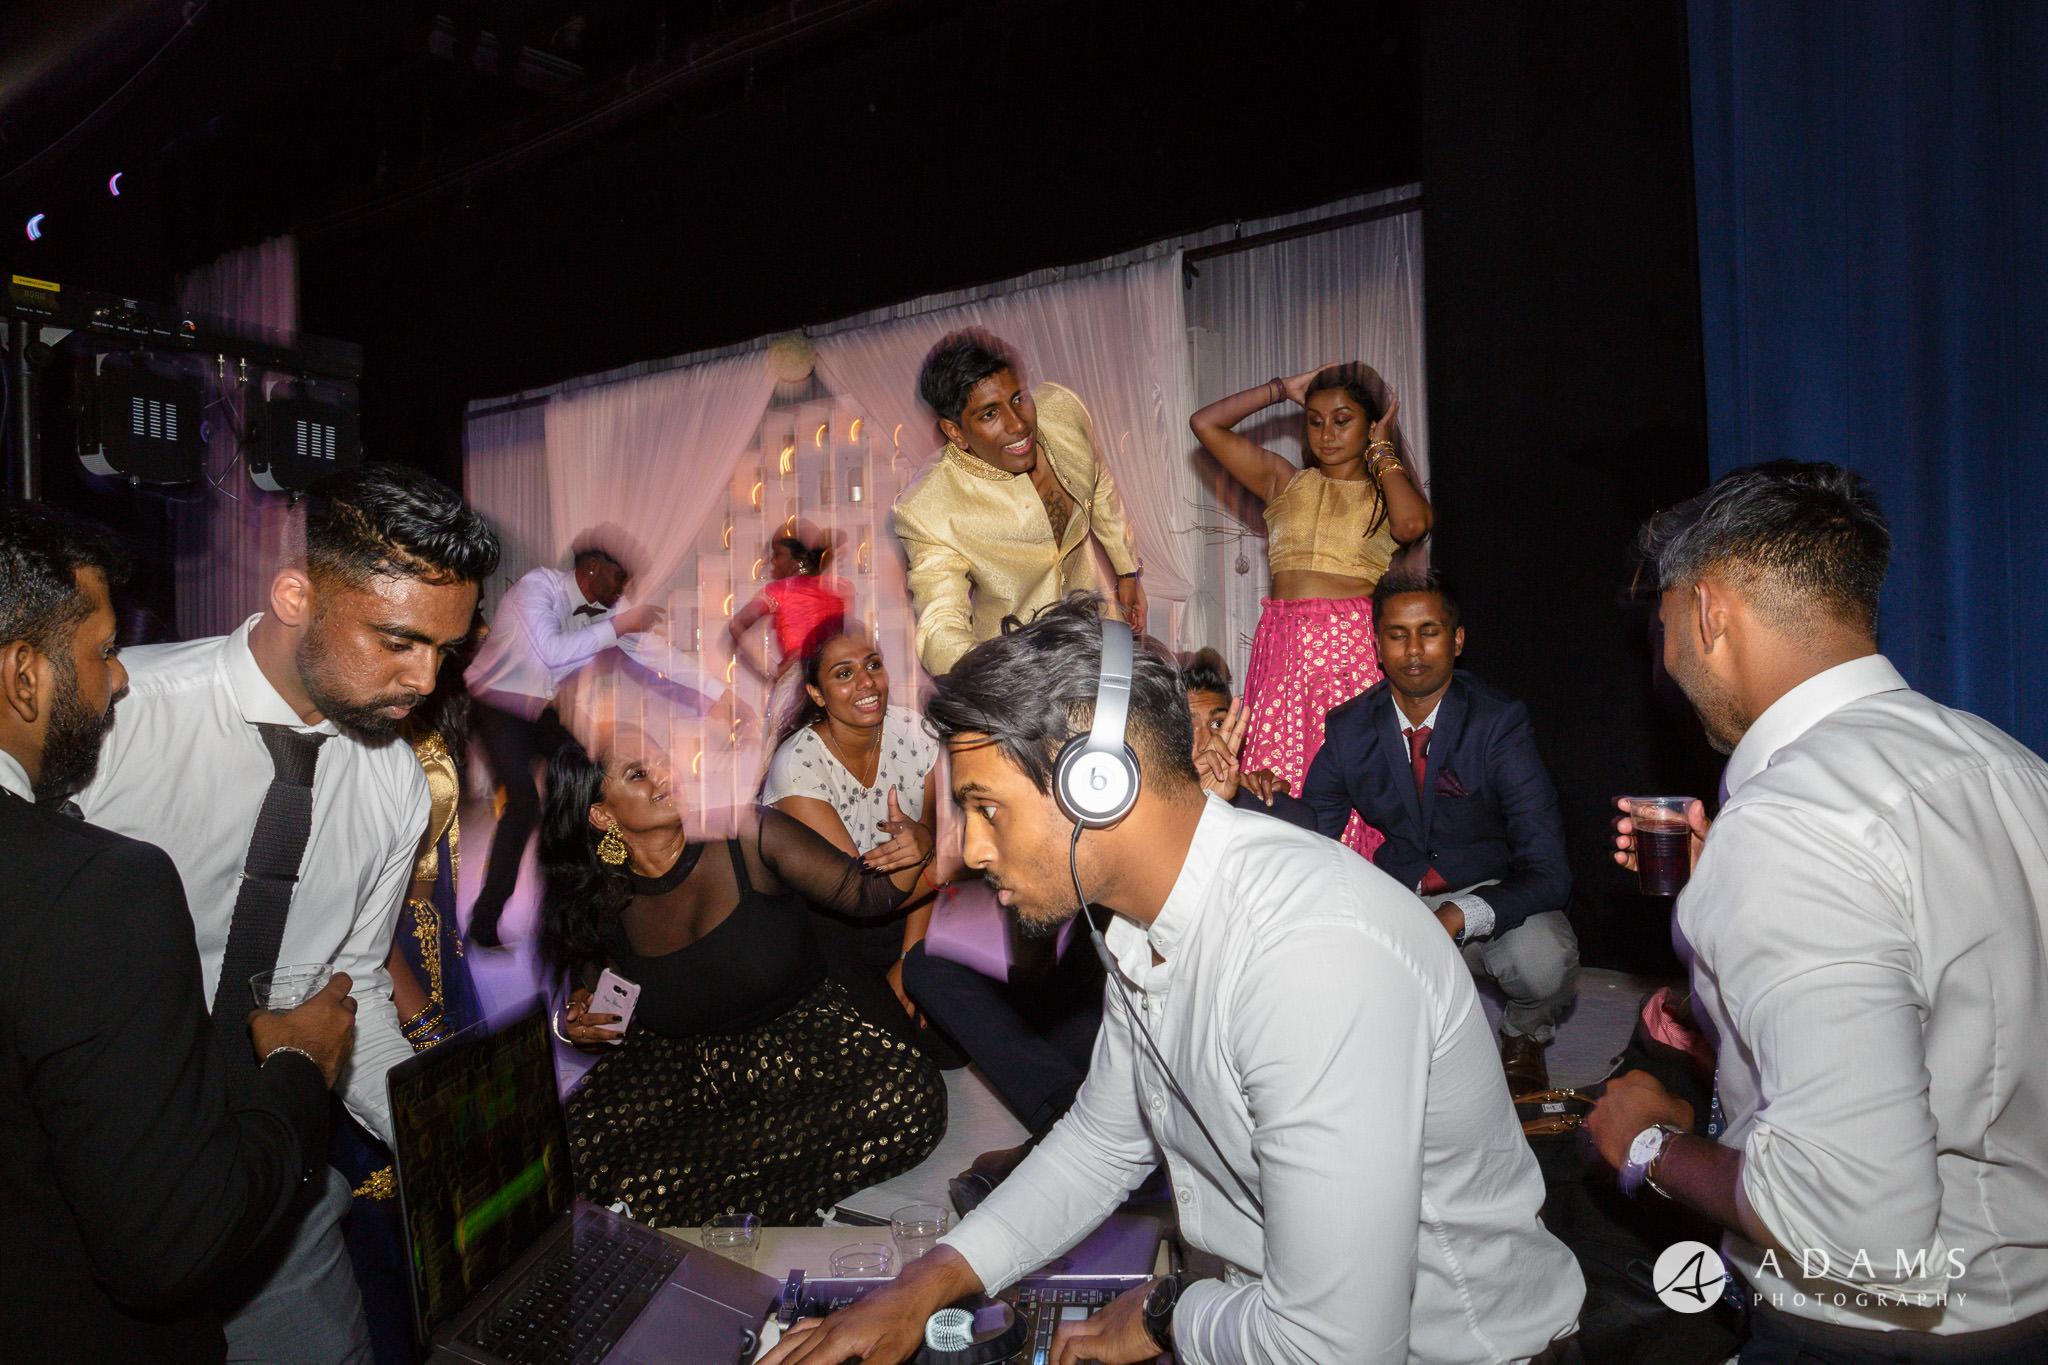 Oslo Wedding Photo dj